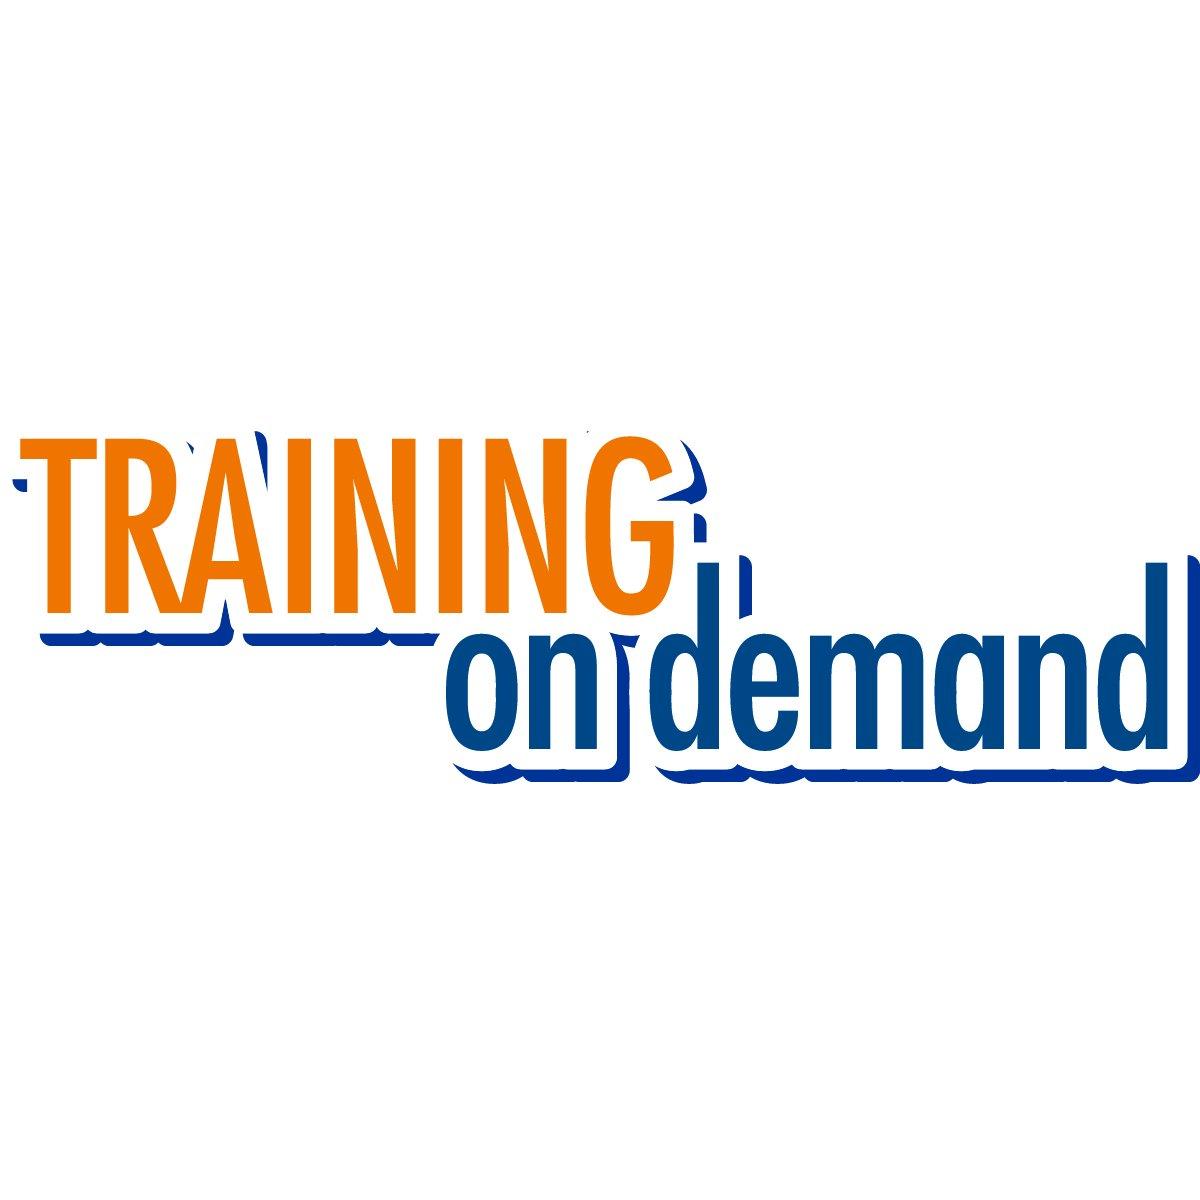 trainingondemand hashtag on Twitter